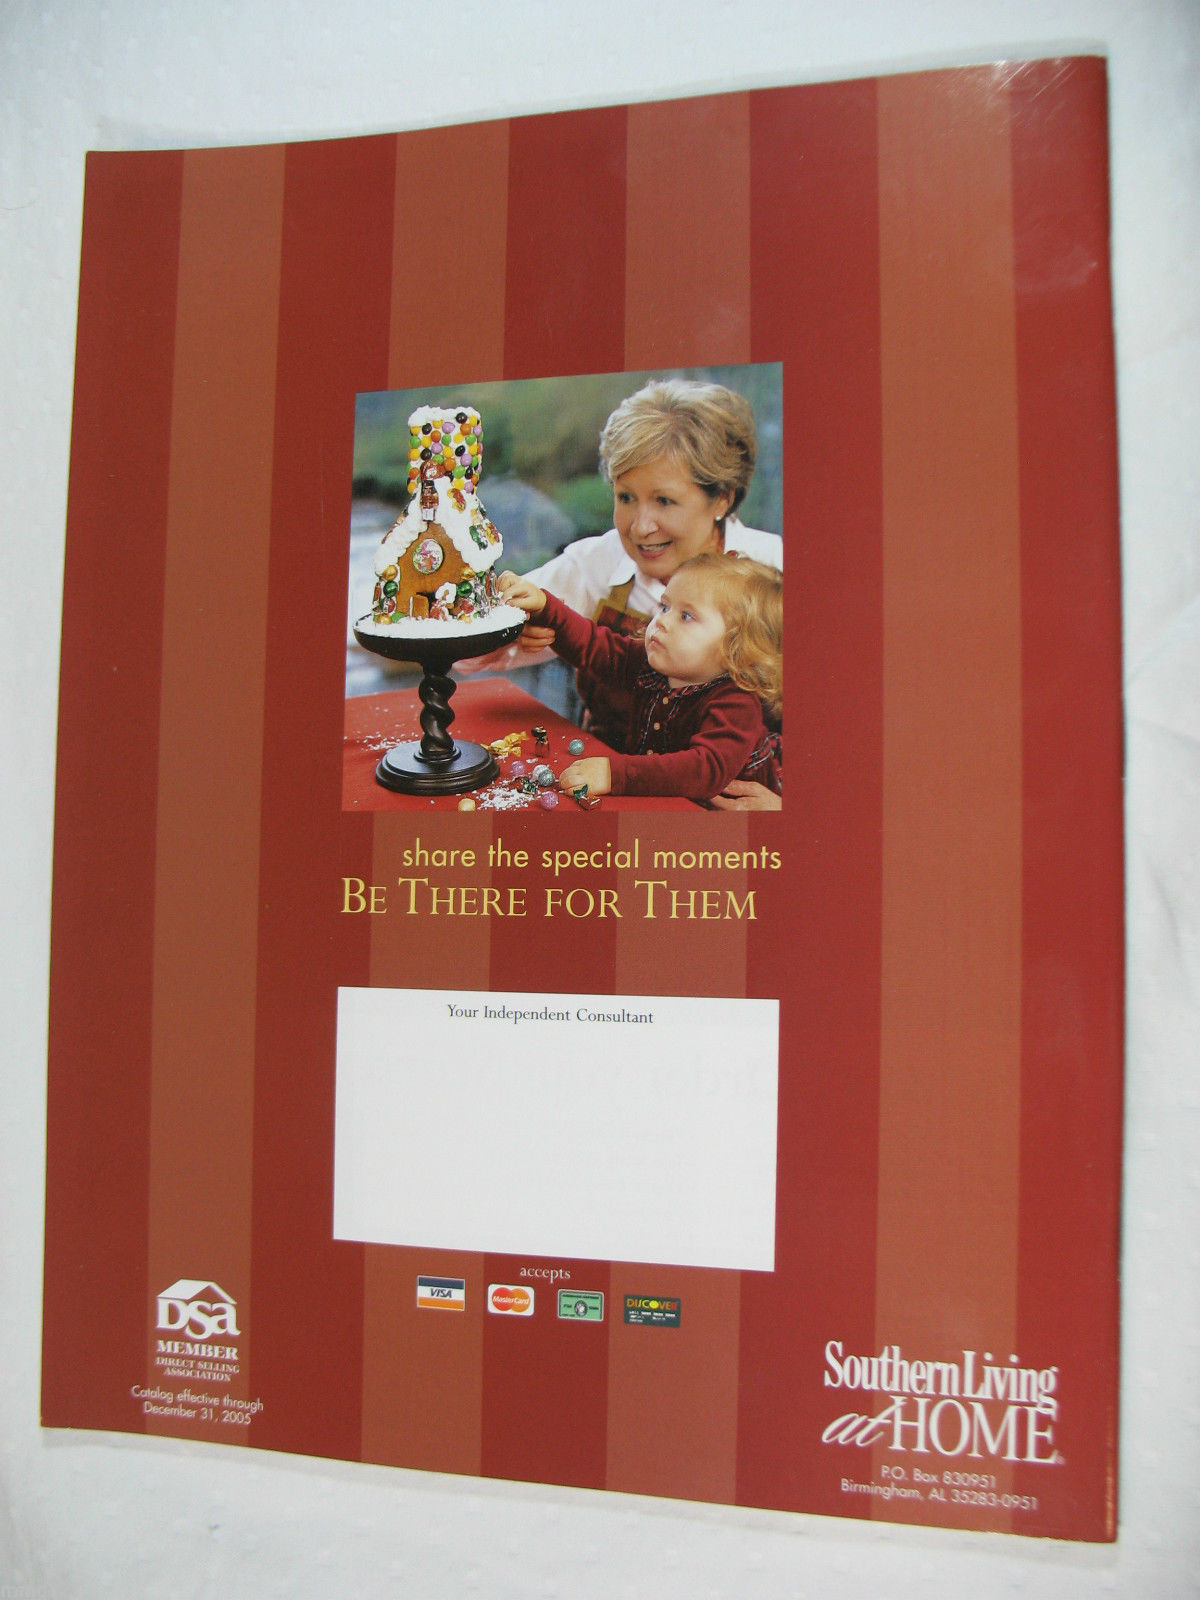 Southern Living At Home Fall 2005 Catalog Decorating Entertaining Organizing